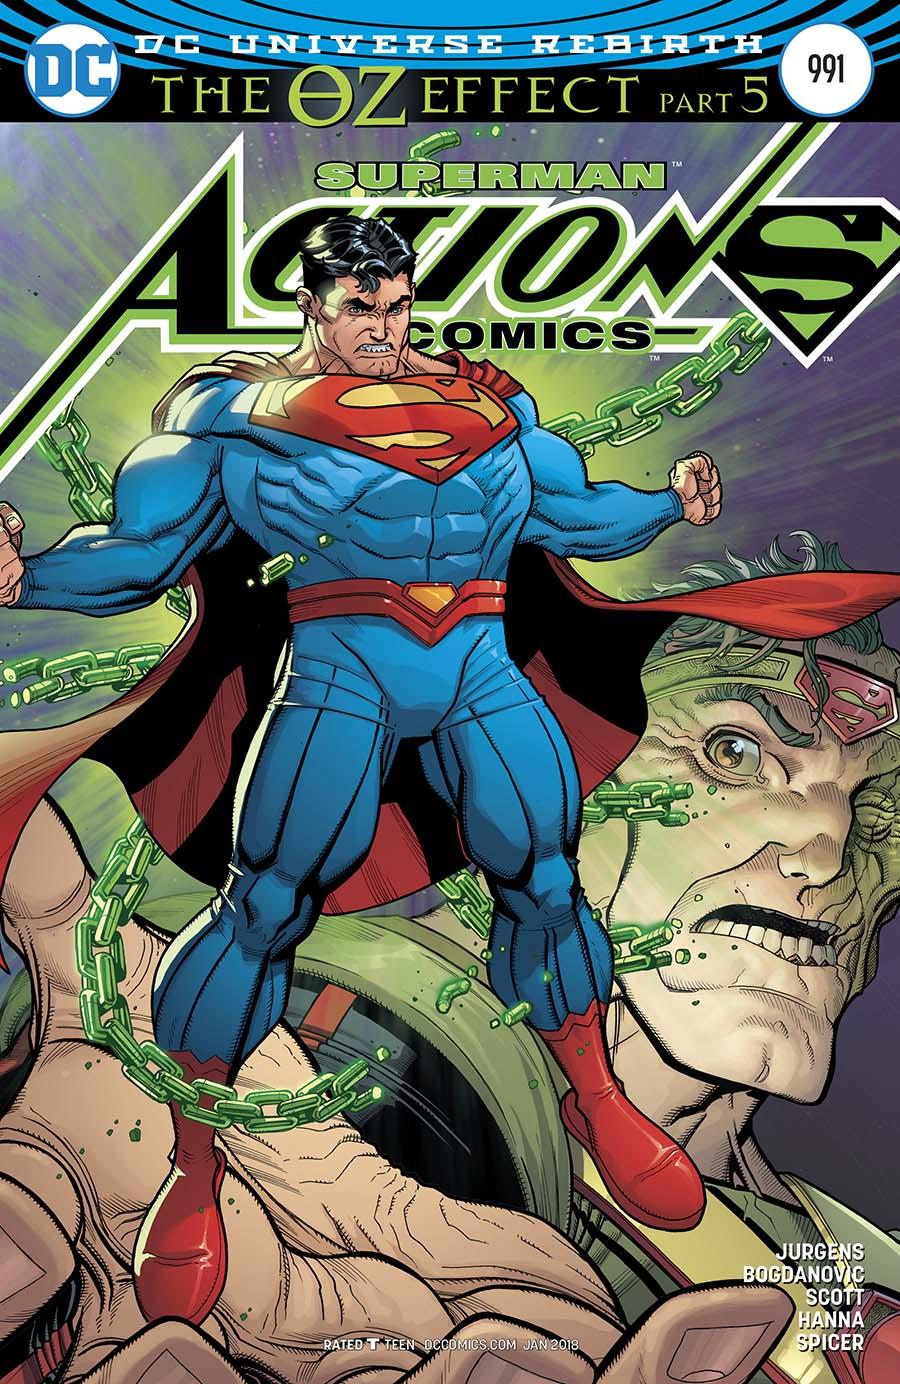 Action Comics Vol 2 #991 Cover B Variant Nick Bradshaw Non-Lenticular Cover